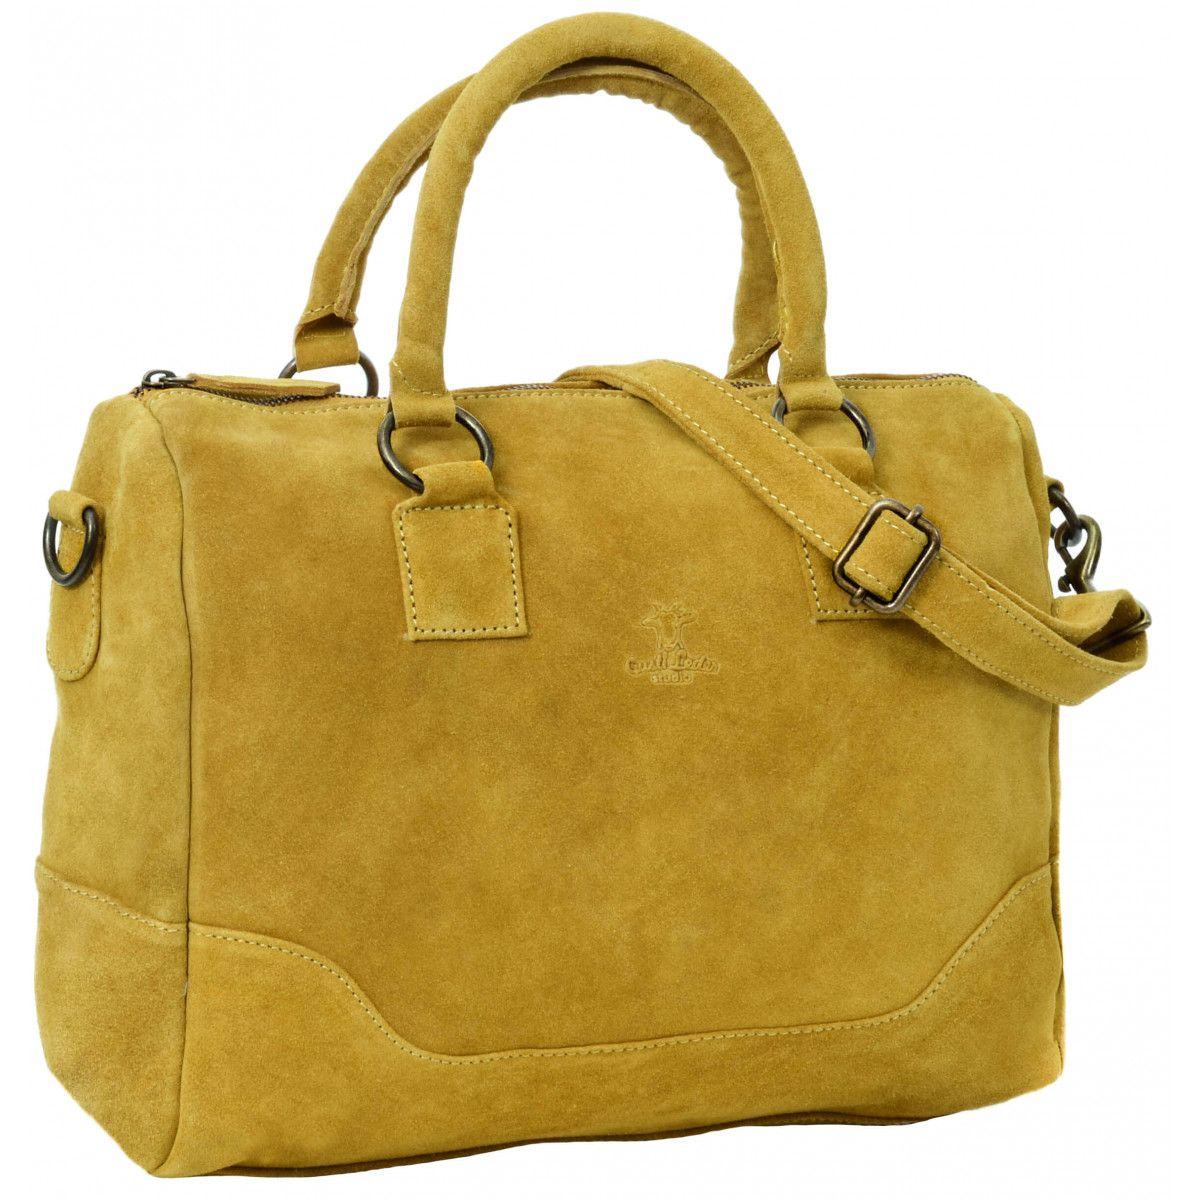 Mia-Shopper Ledertasche Handtasche Umhängetasche-31  d49e6c41c0ee3